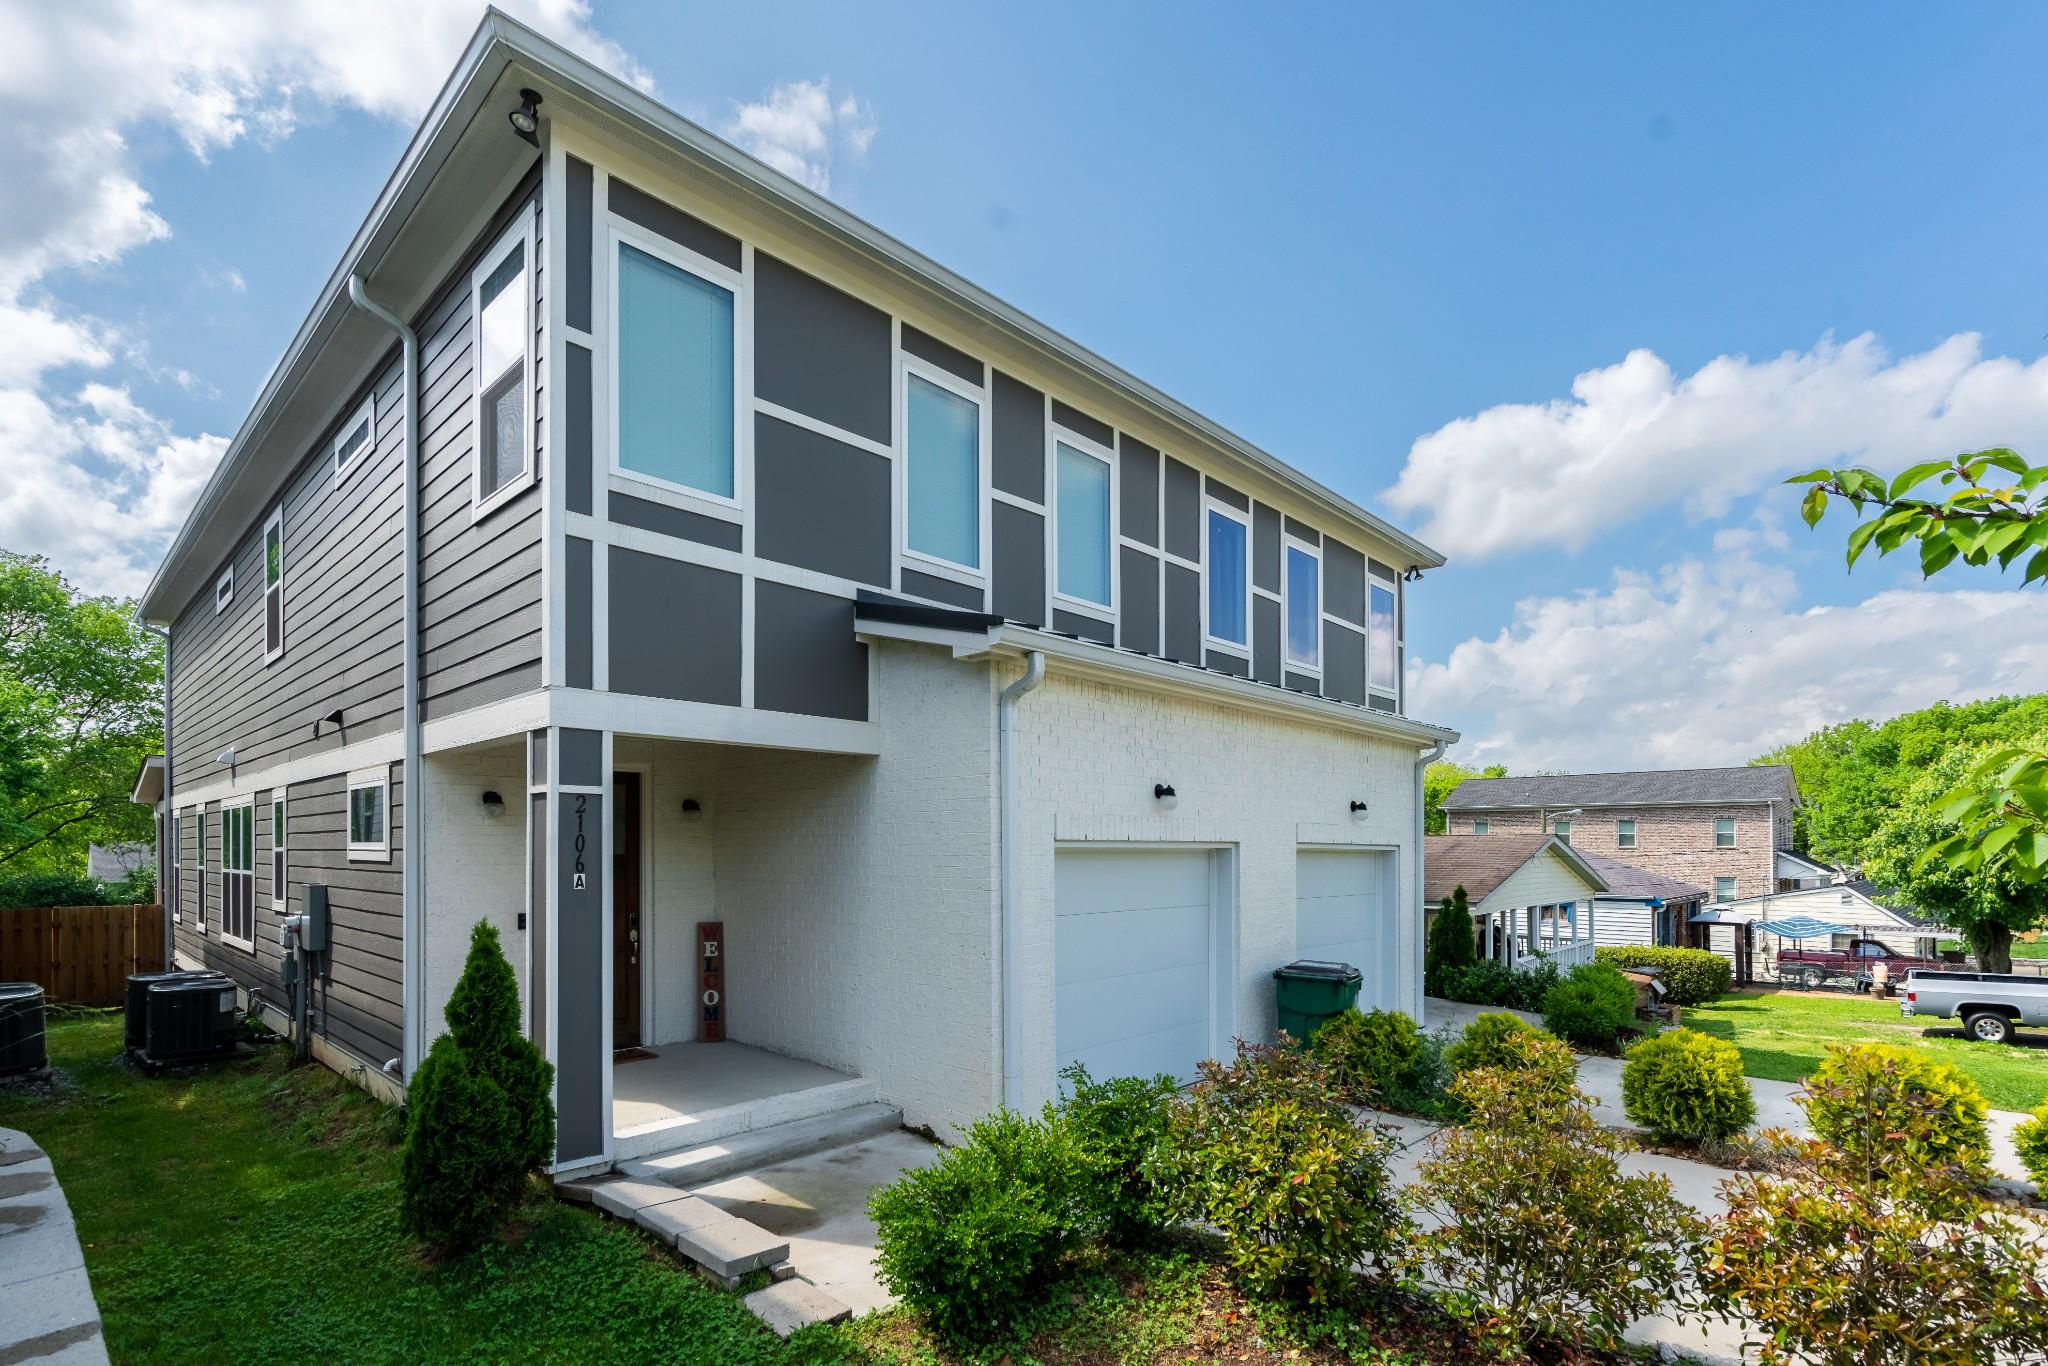 2106A Burns St Property Photo - Nashville, TN real estate listing